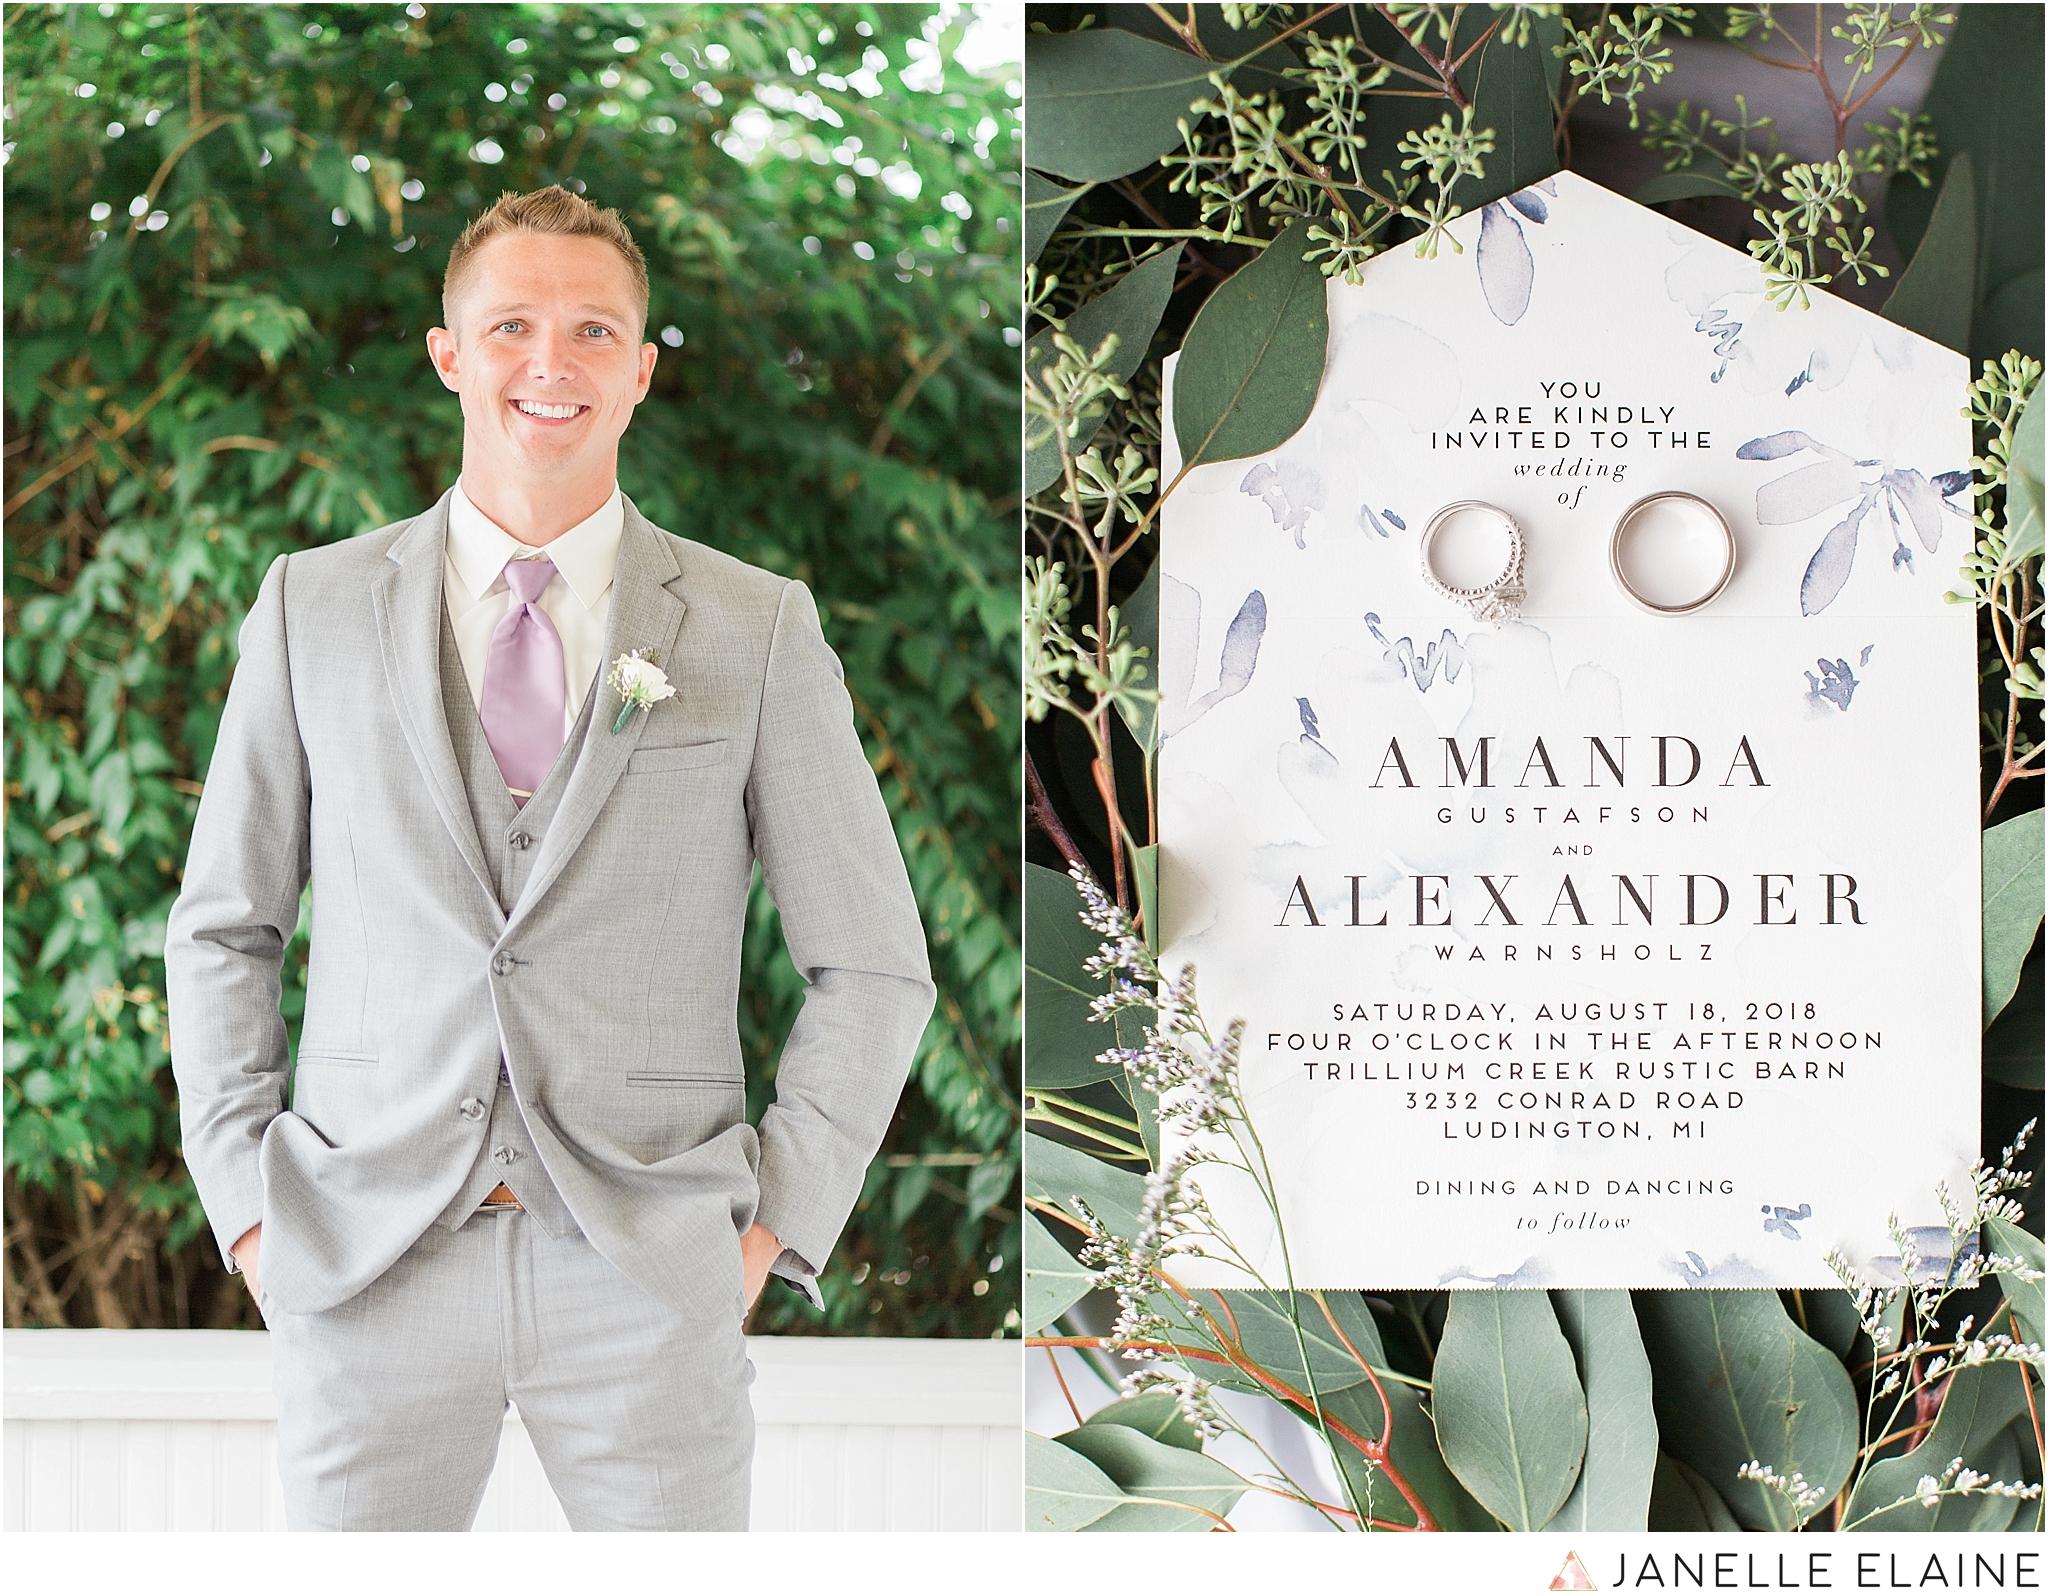 warnsholz-wedding-michigan-photography-janelle elaine photography-68.jpg